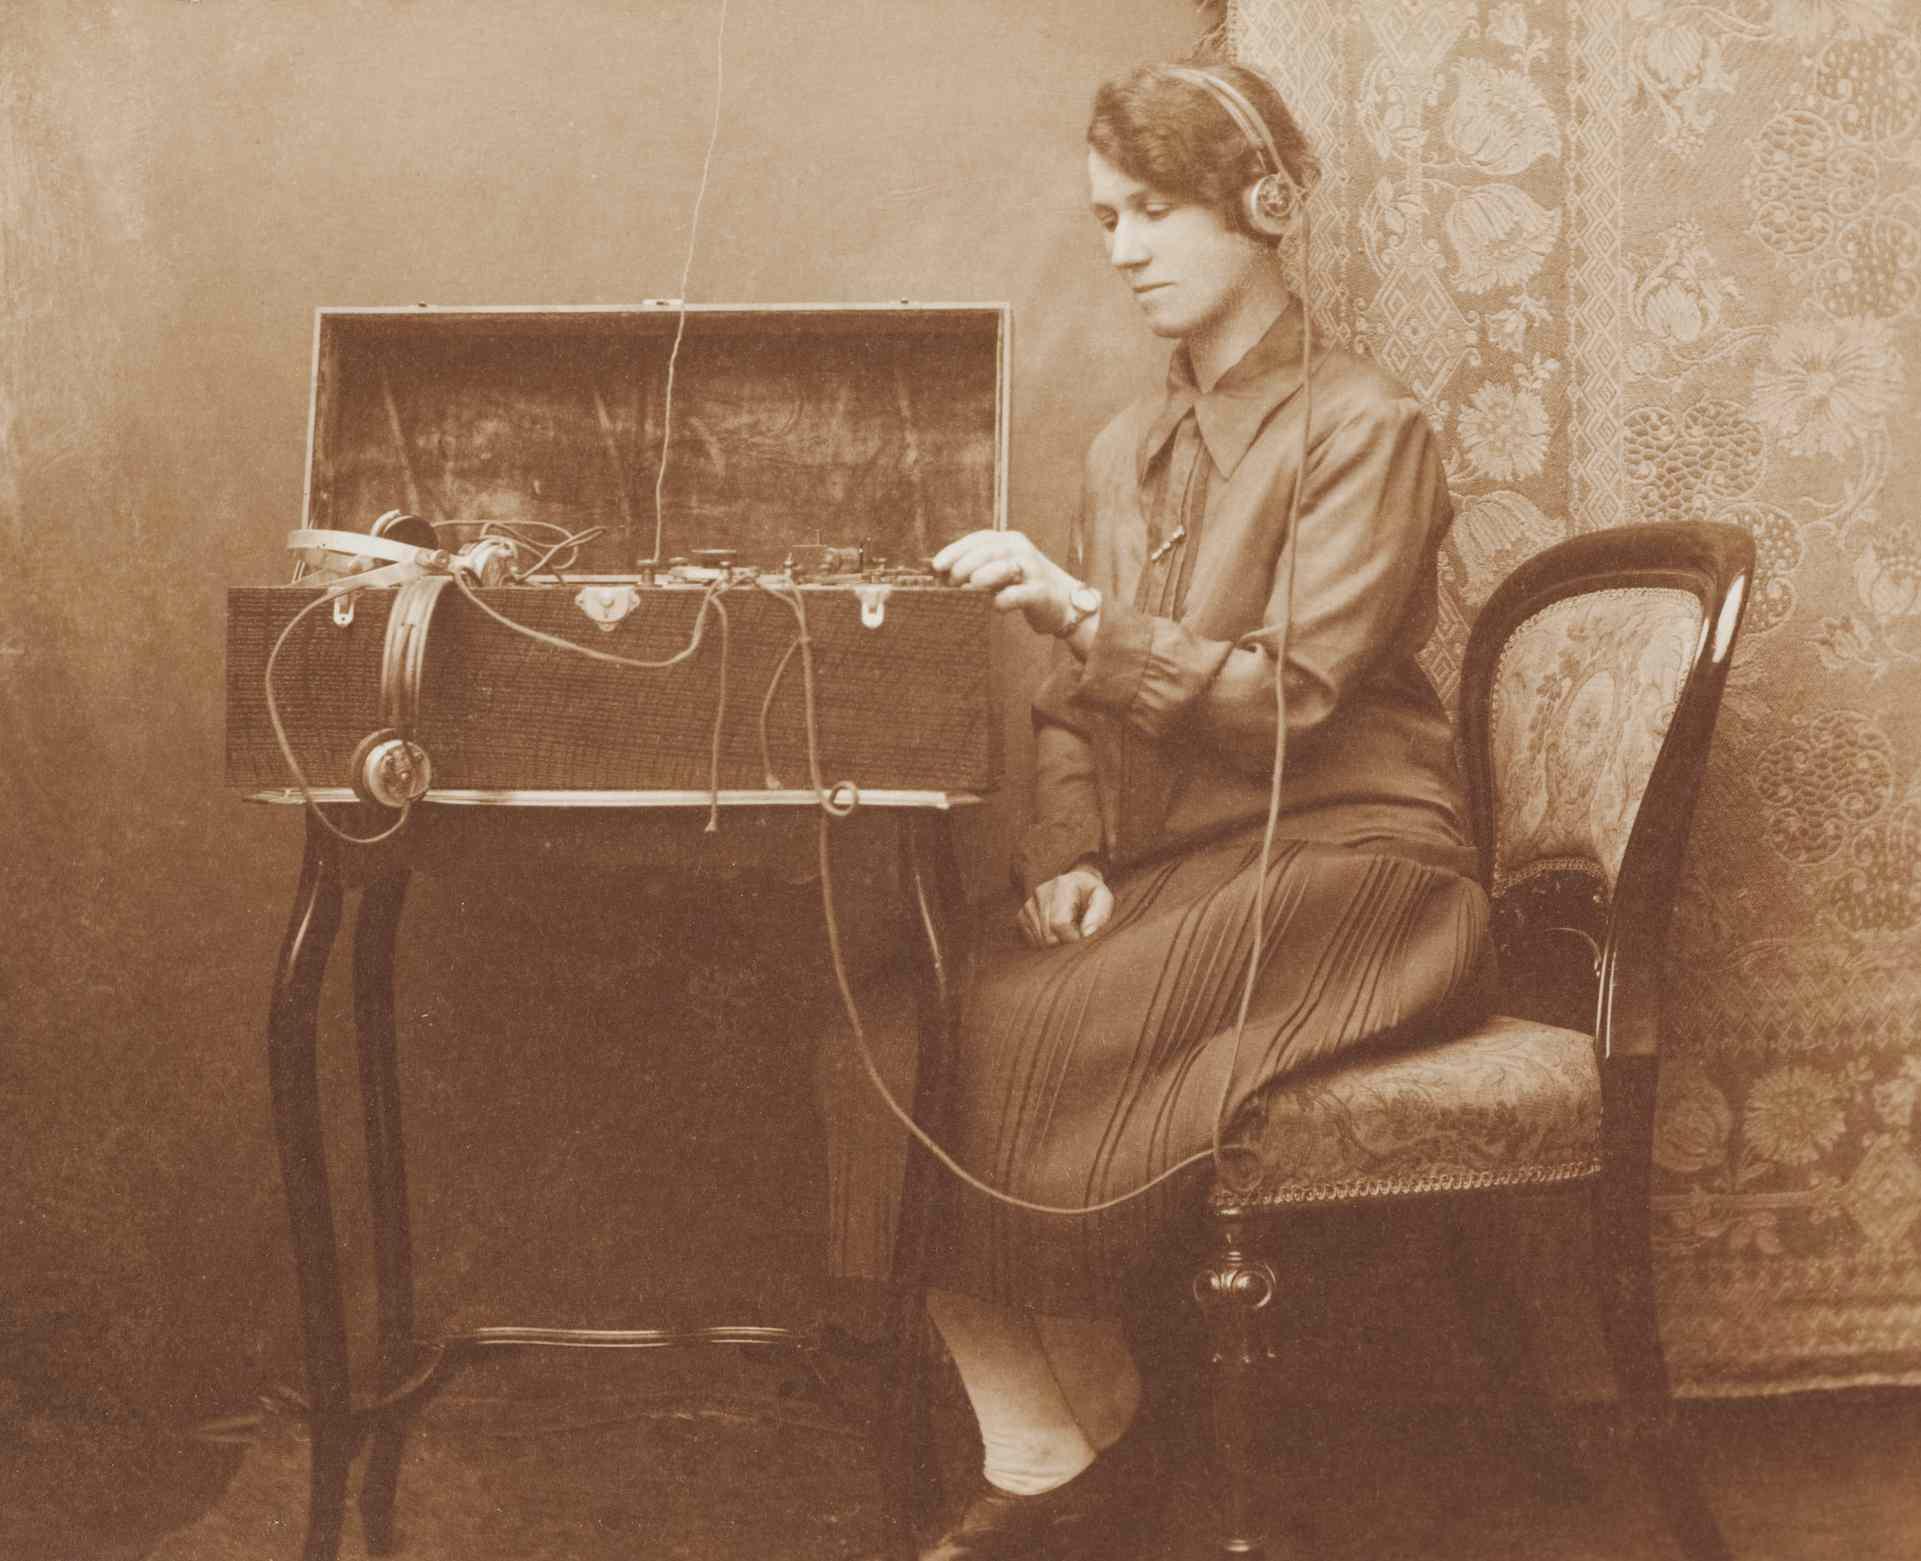 A wartime photo of a Morse code communicator.